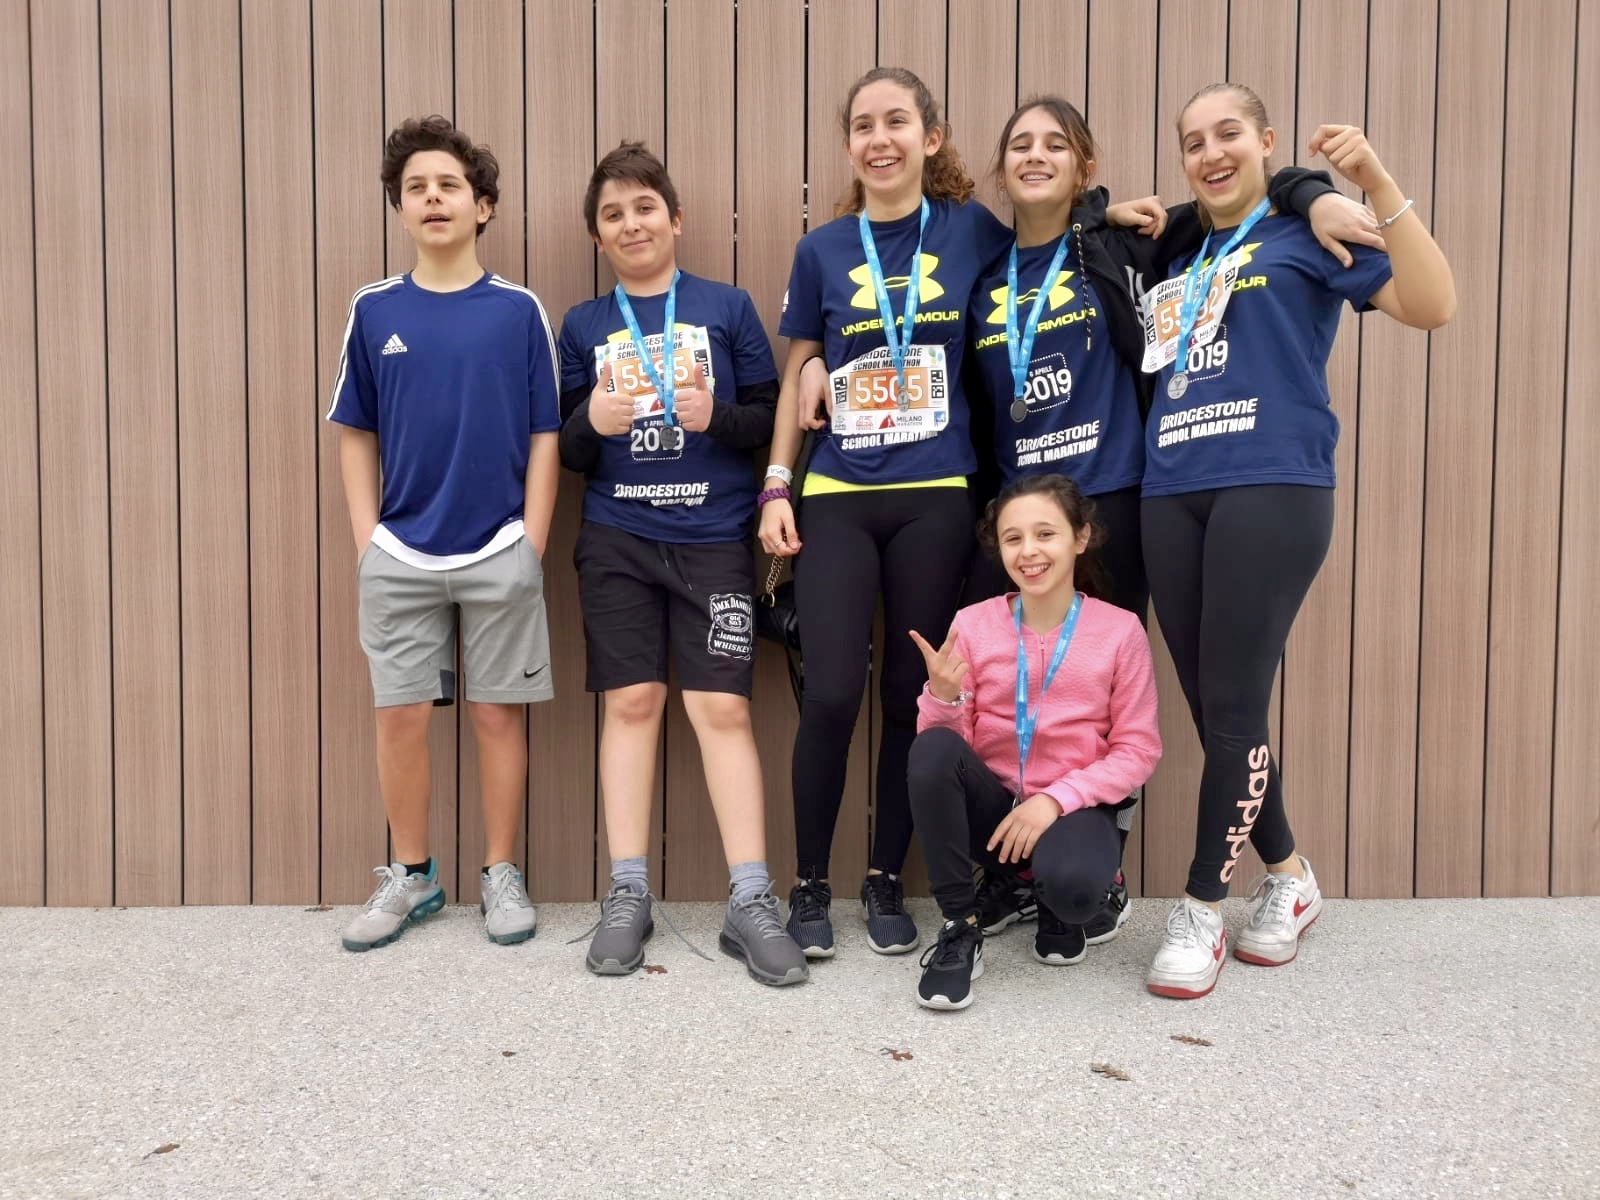 Istituto San Giuseppe La Salle Milano Bridgestone School Marathon 2019_2